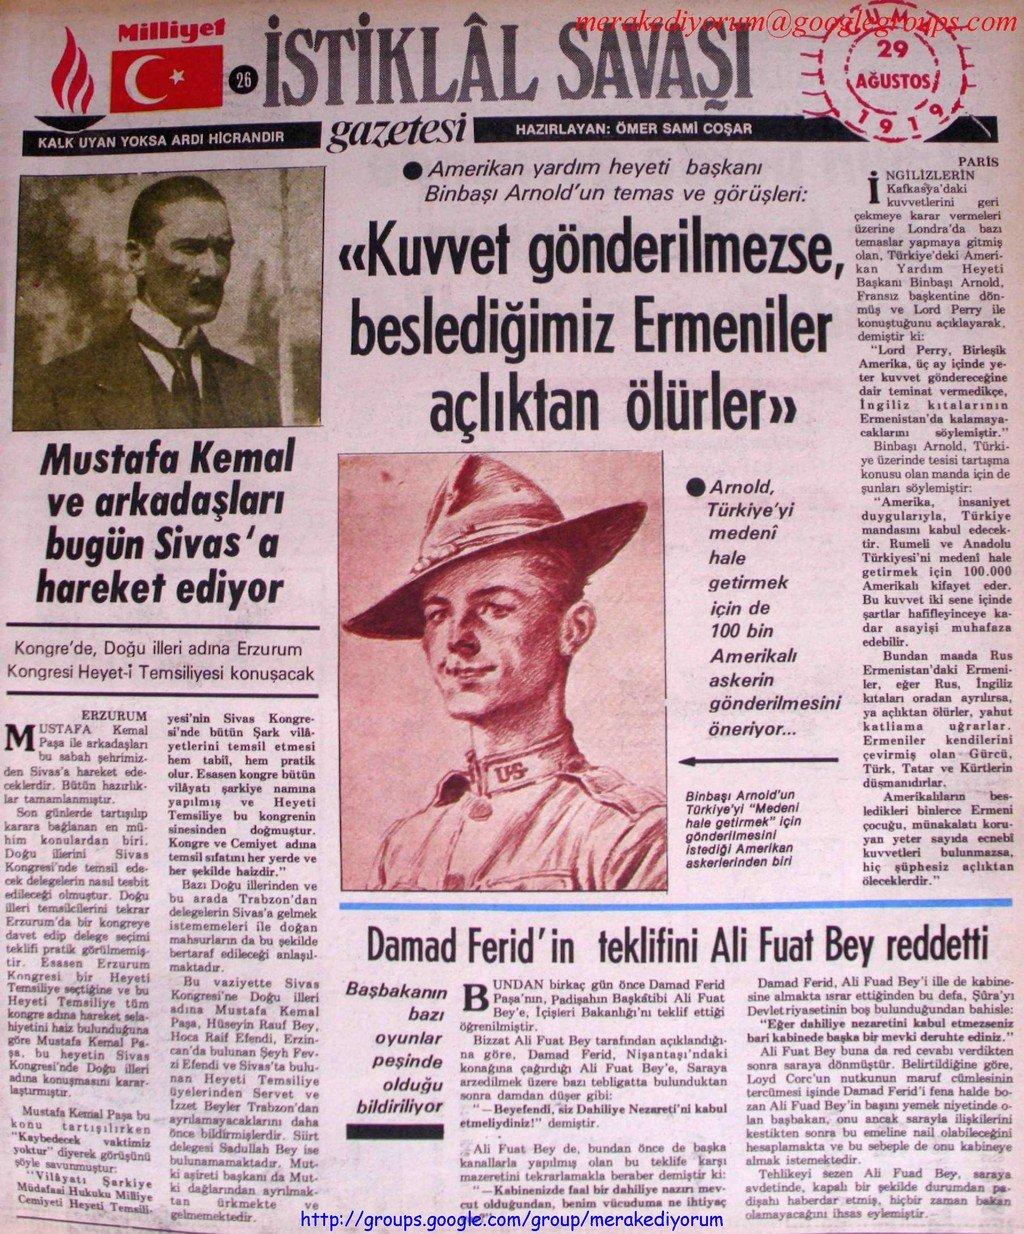 istiklal savaşı gazetesi - 29 ağustos 1919